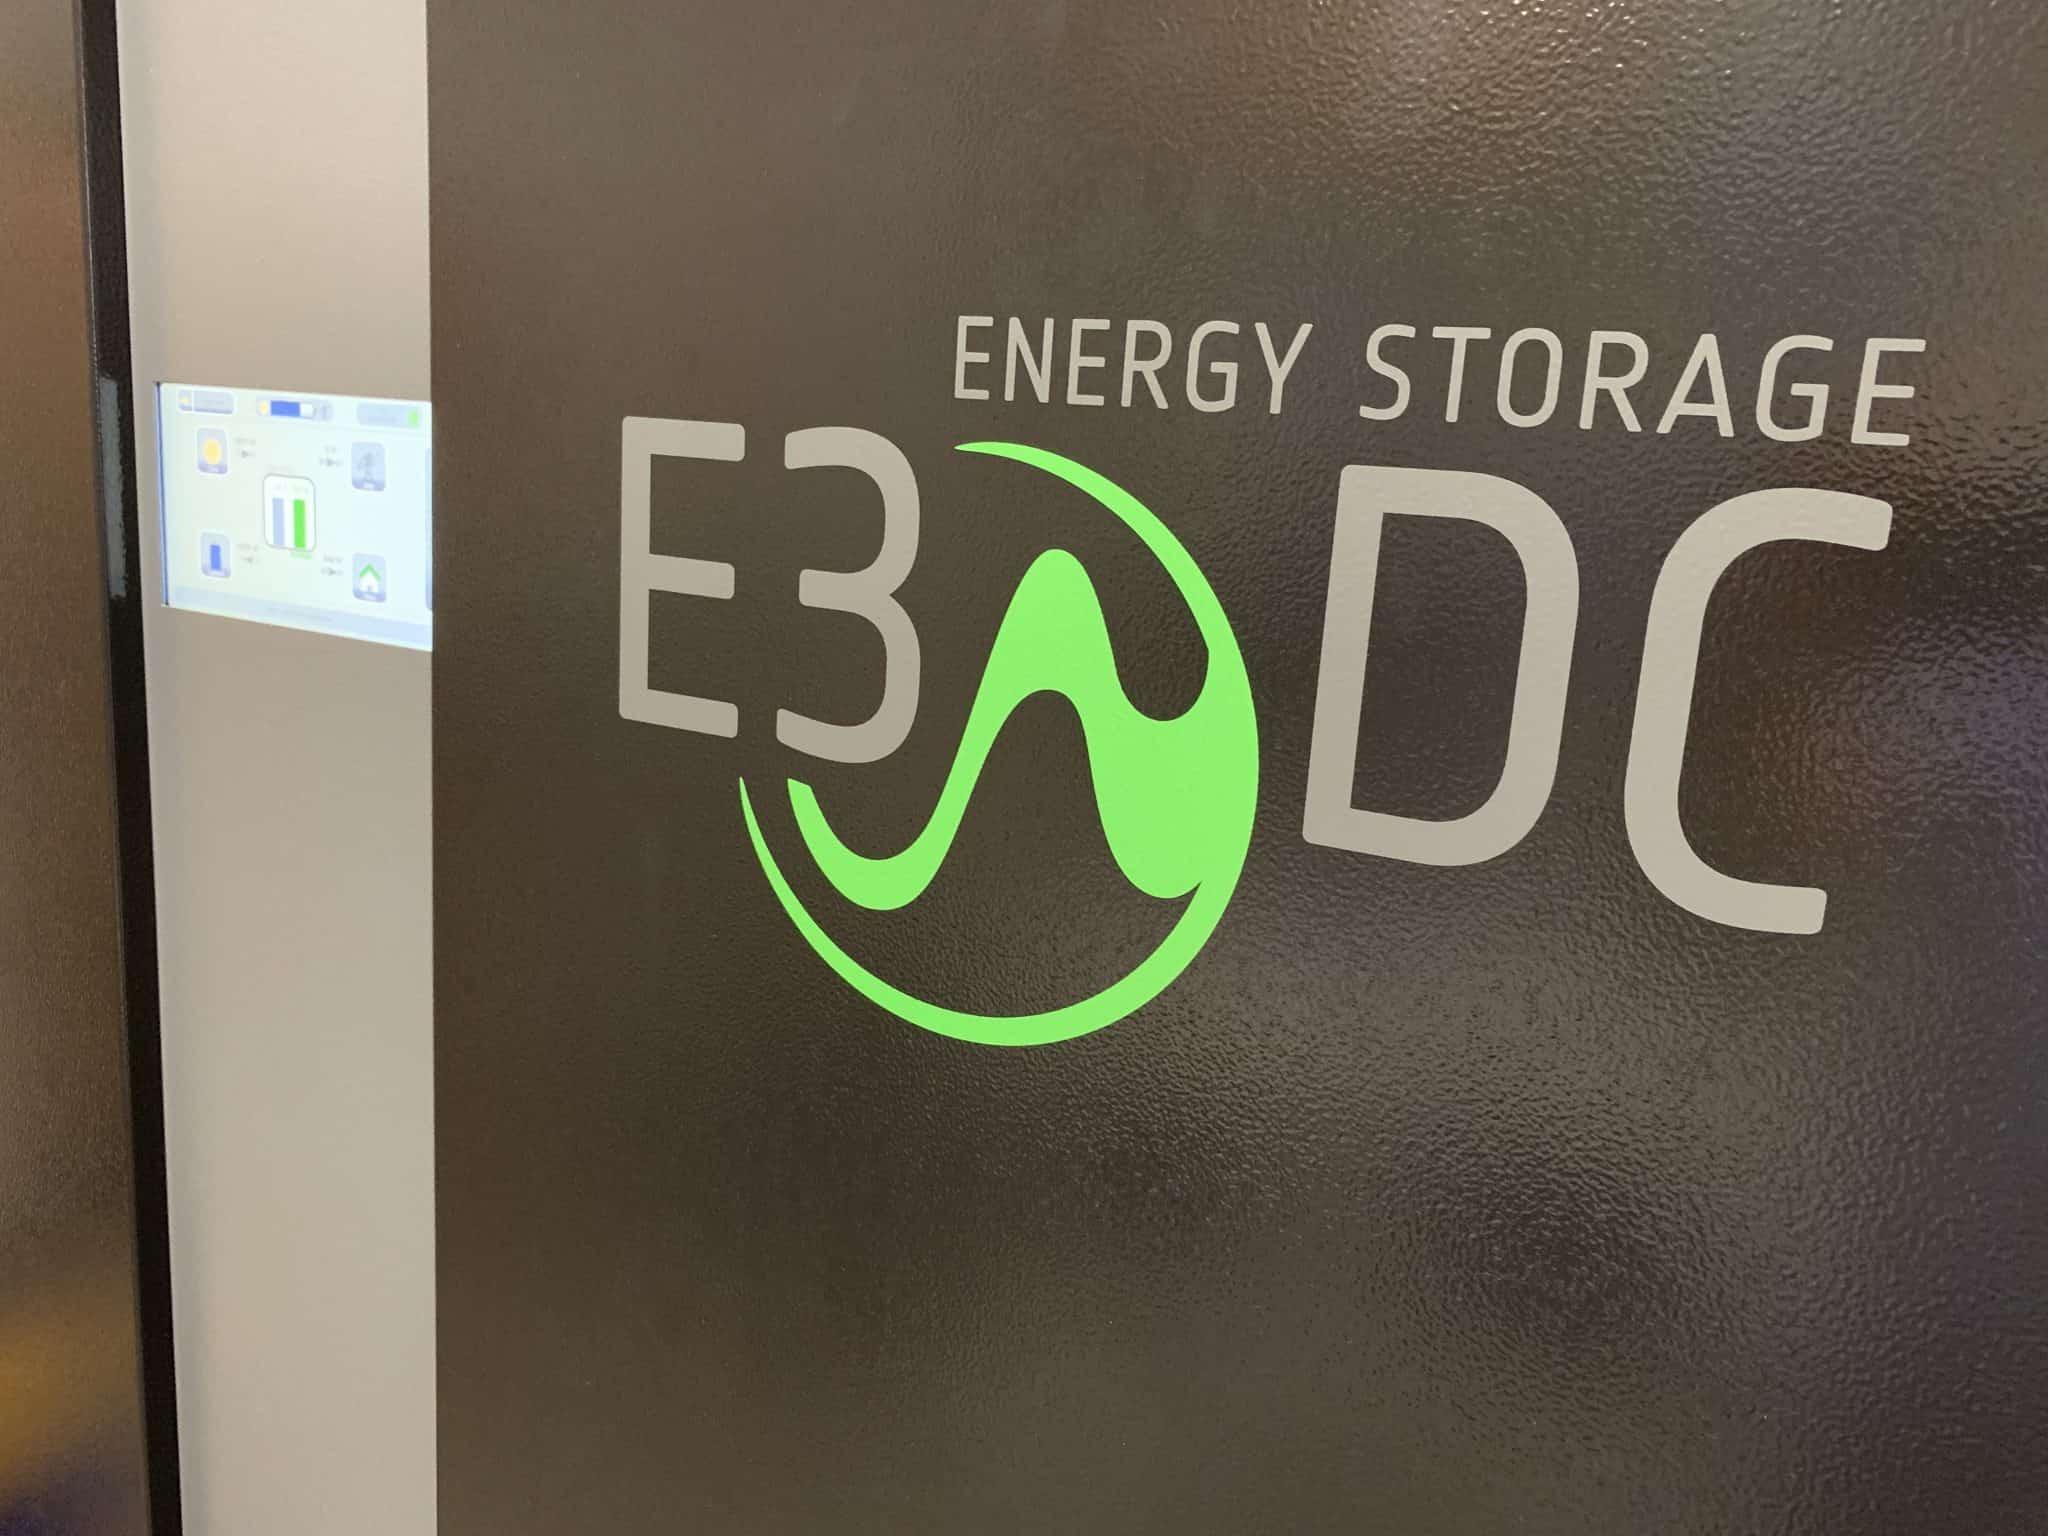 Das E3/DC-Hauskraftwerk